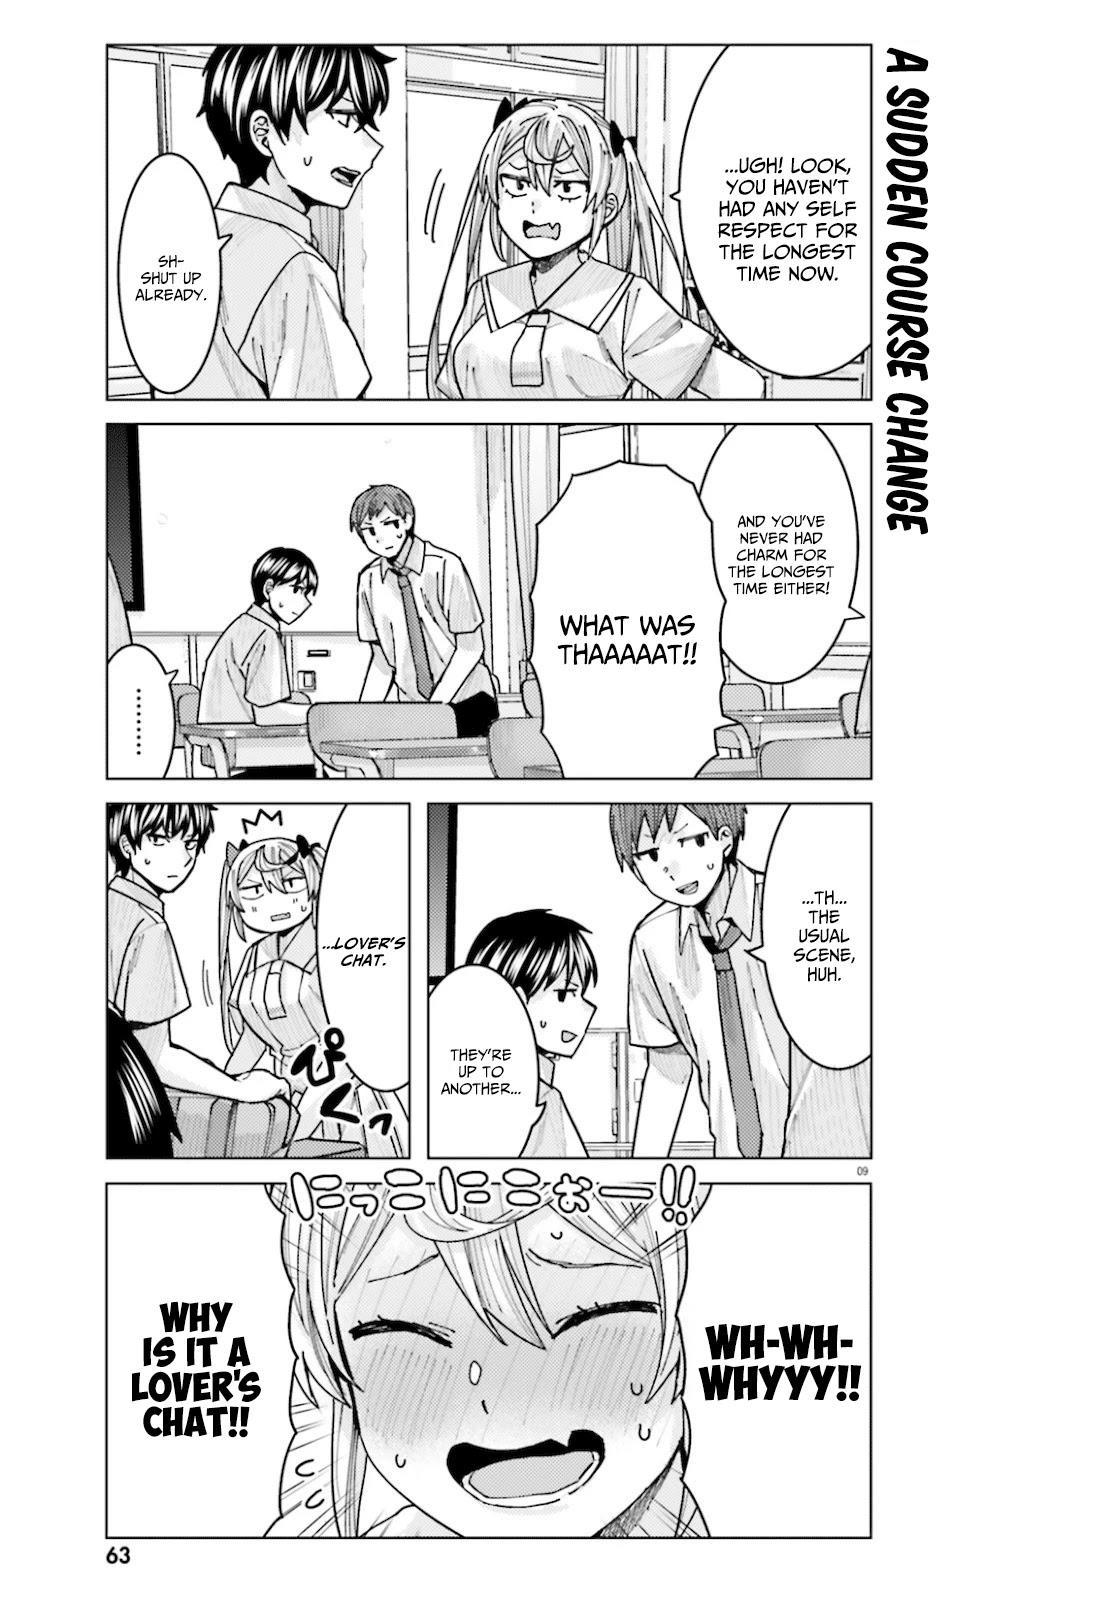 Himegasaki Sakurako Wa Kyoumo Fubin Kawaii! Chapter 11 page 9 - Mangakakalots.com